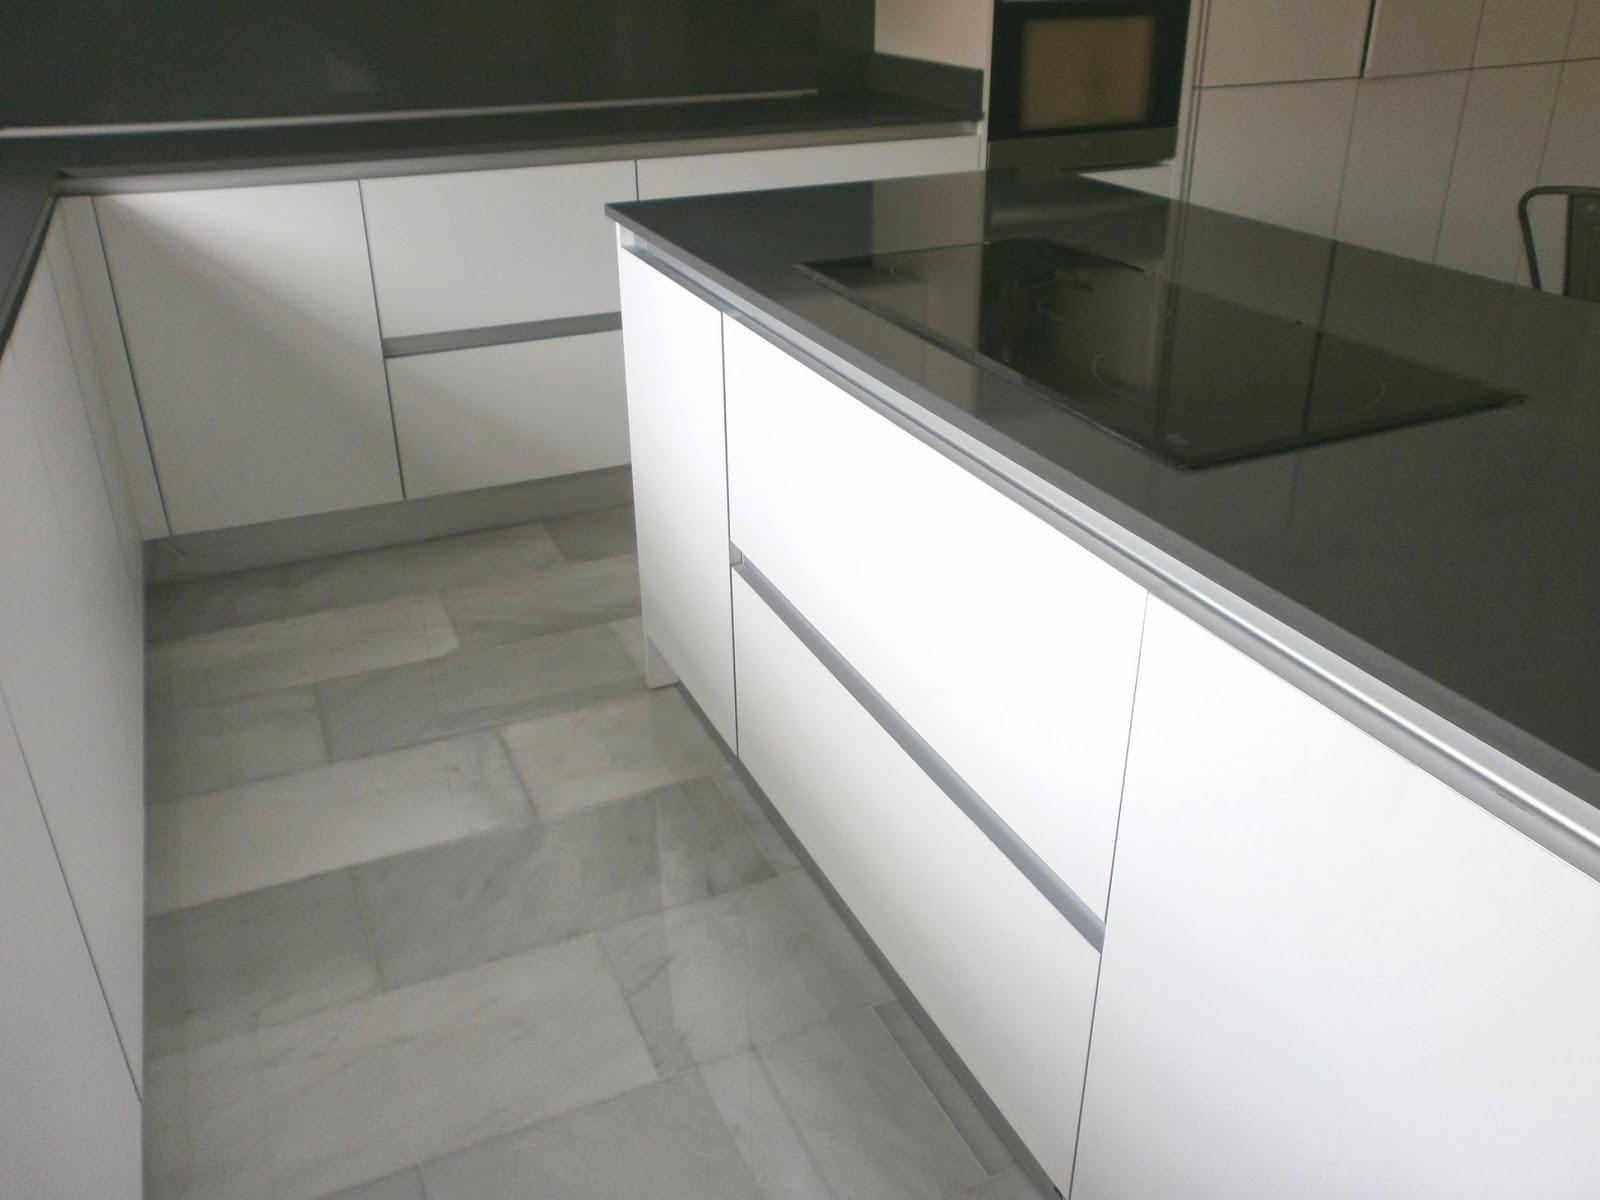 Encantadora cocina blanca independiente con isla y office cocinas con estilo ideas para - Tiradores de cocina modernos ...